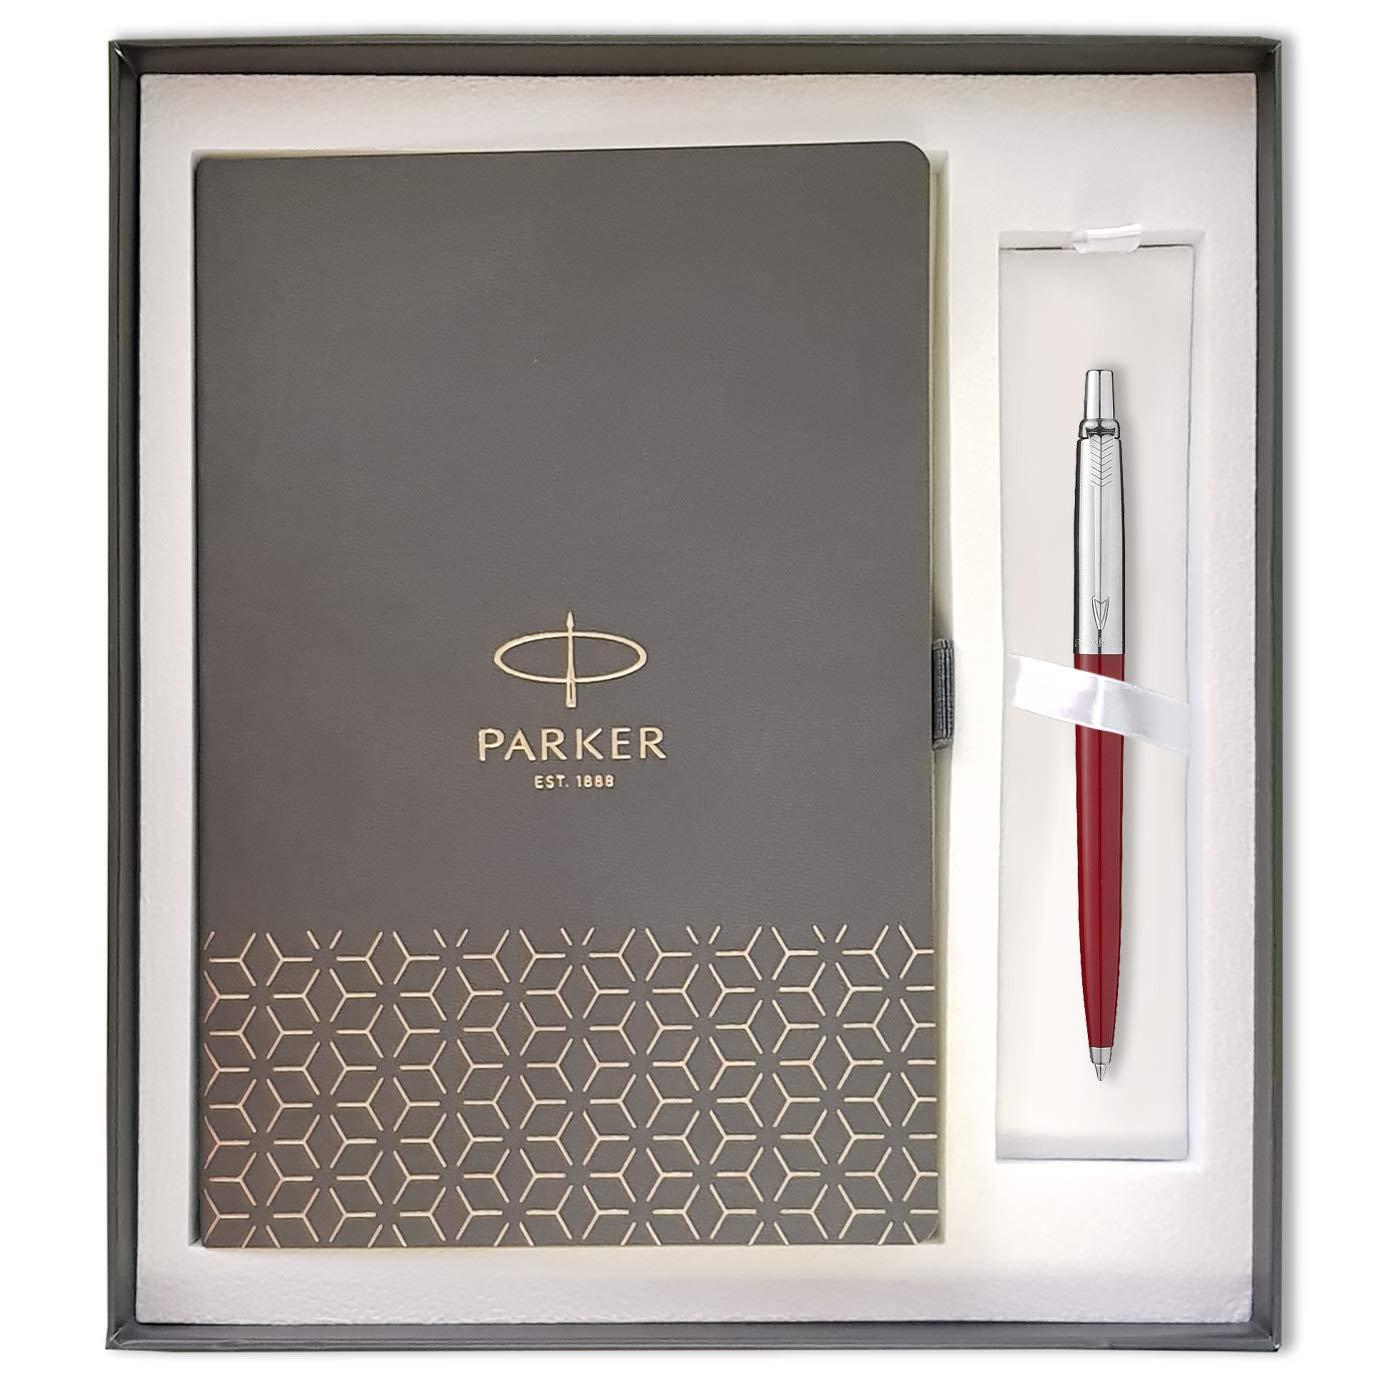 PARKER bianco Penna a sferaJotter Set regalo per notebook formato A5